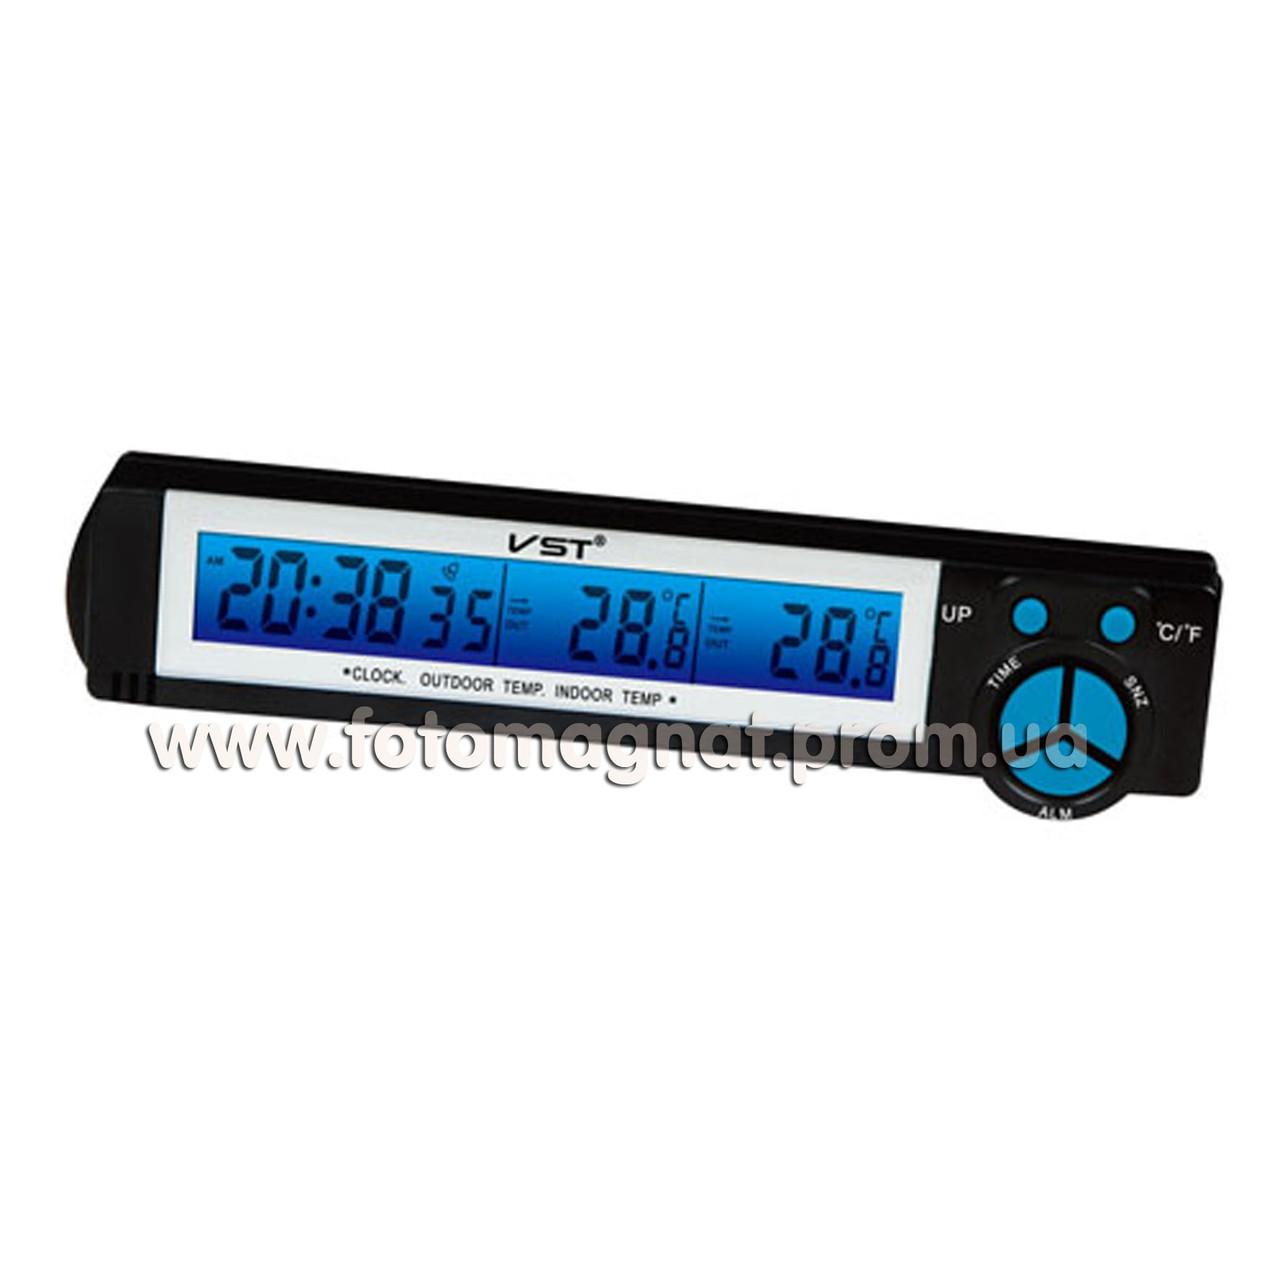 Авточасы VST 7043(часы автомобиль)